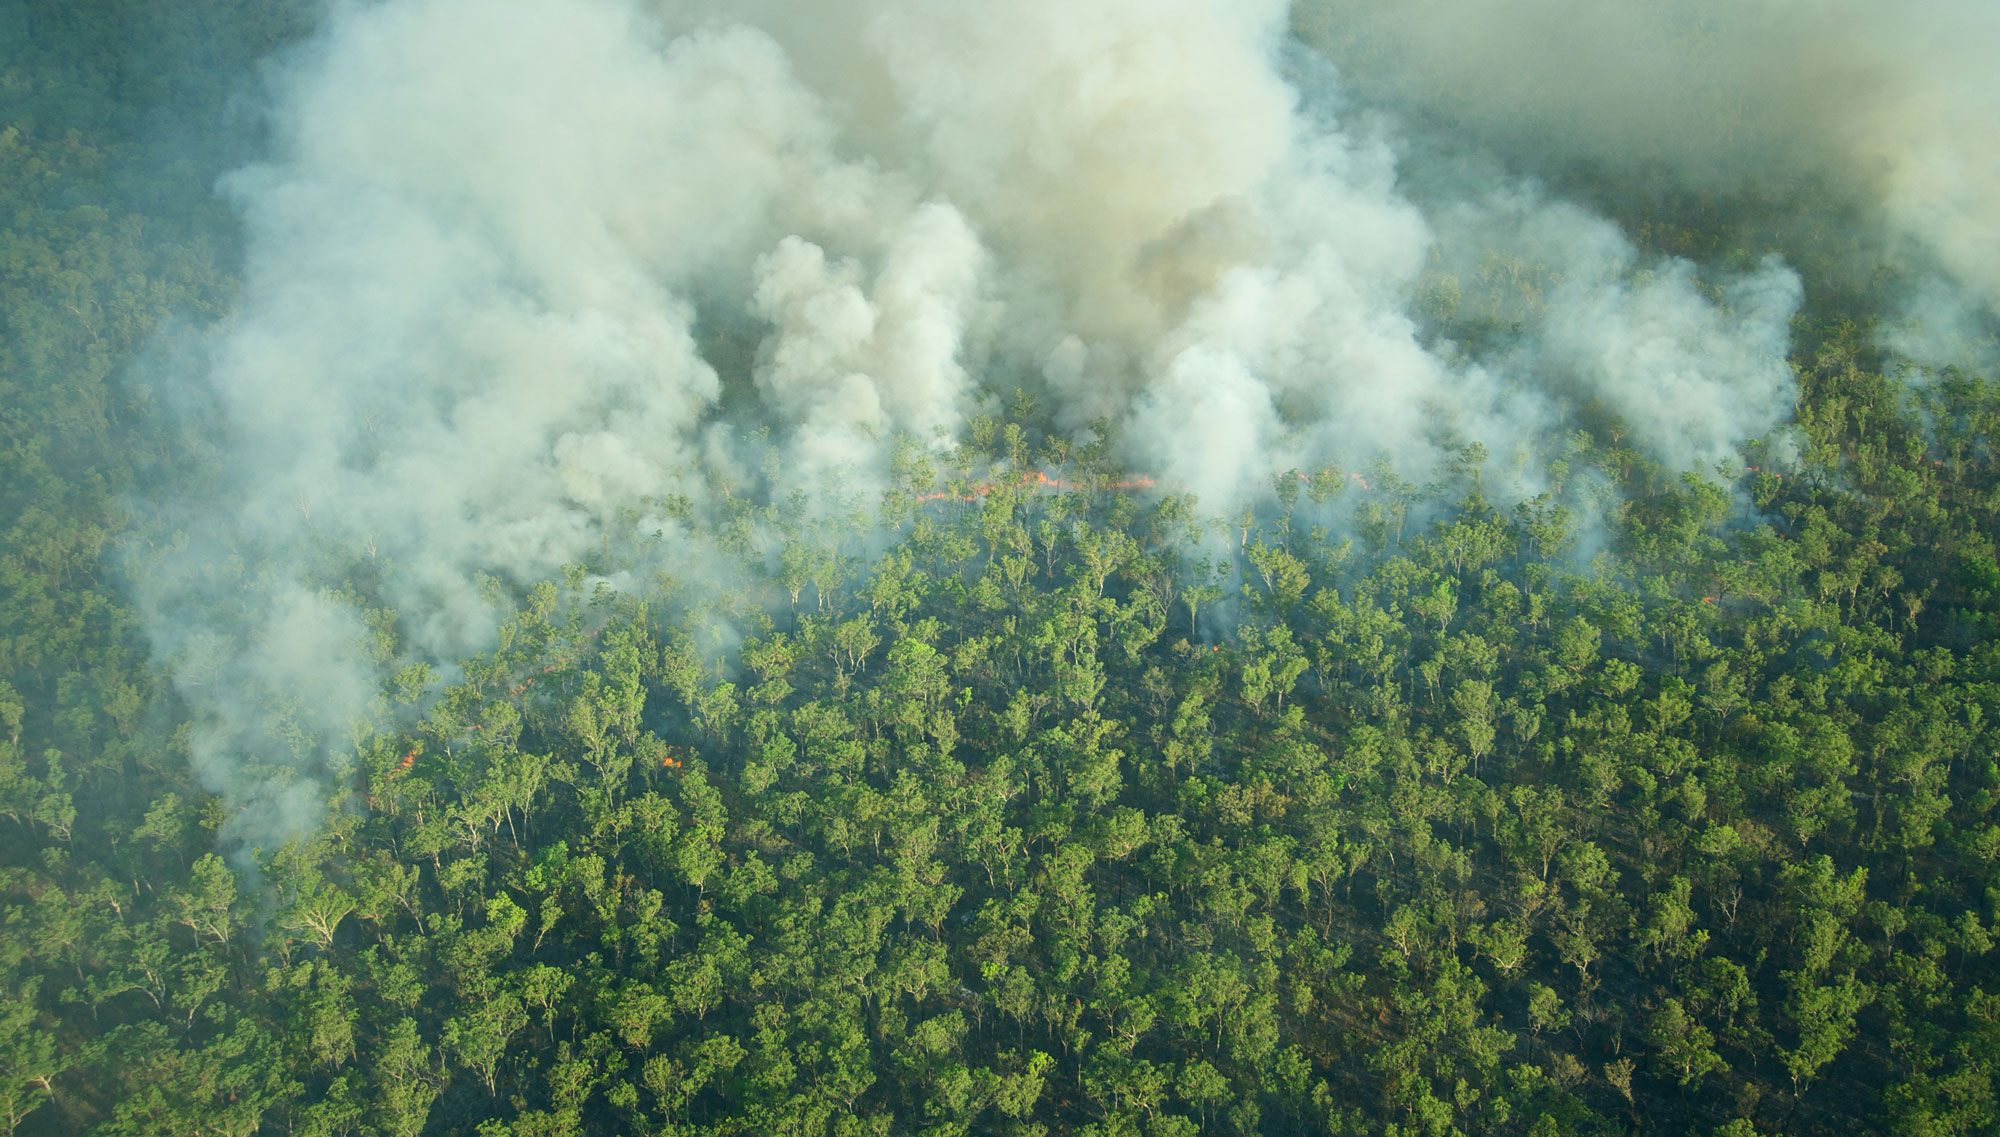 bigstock-Aerial-View-Of-A-Bushfire-In-K-92950595-WEB.jpg